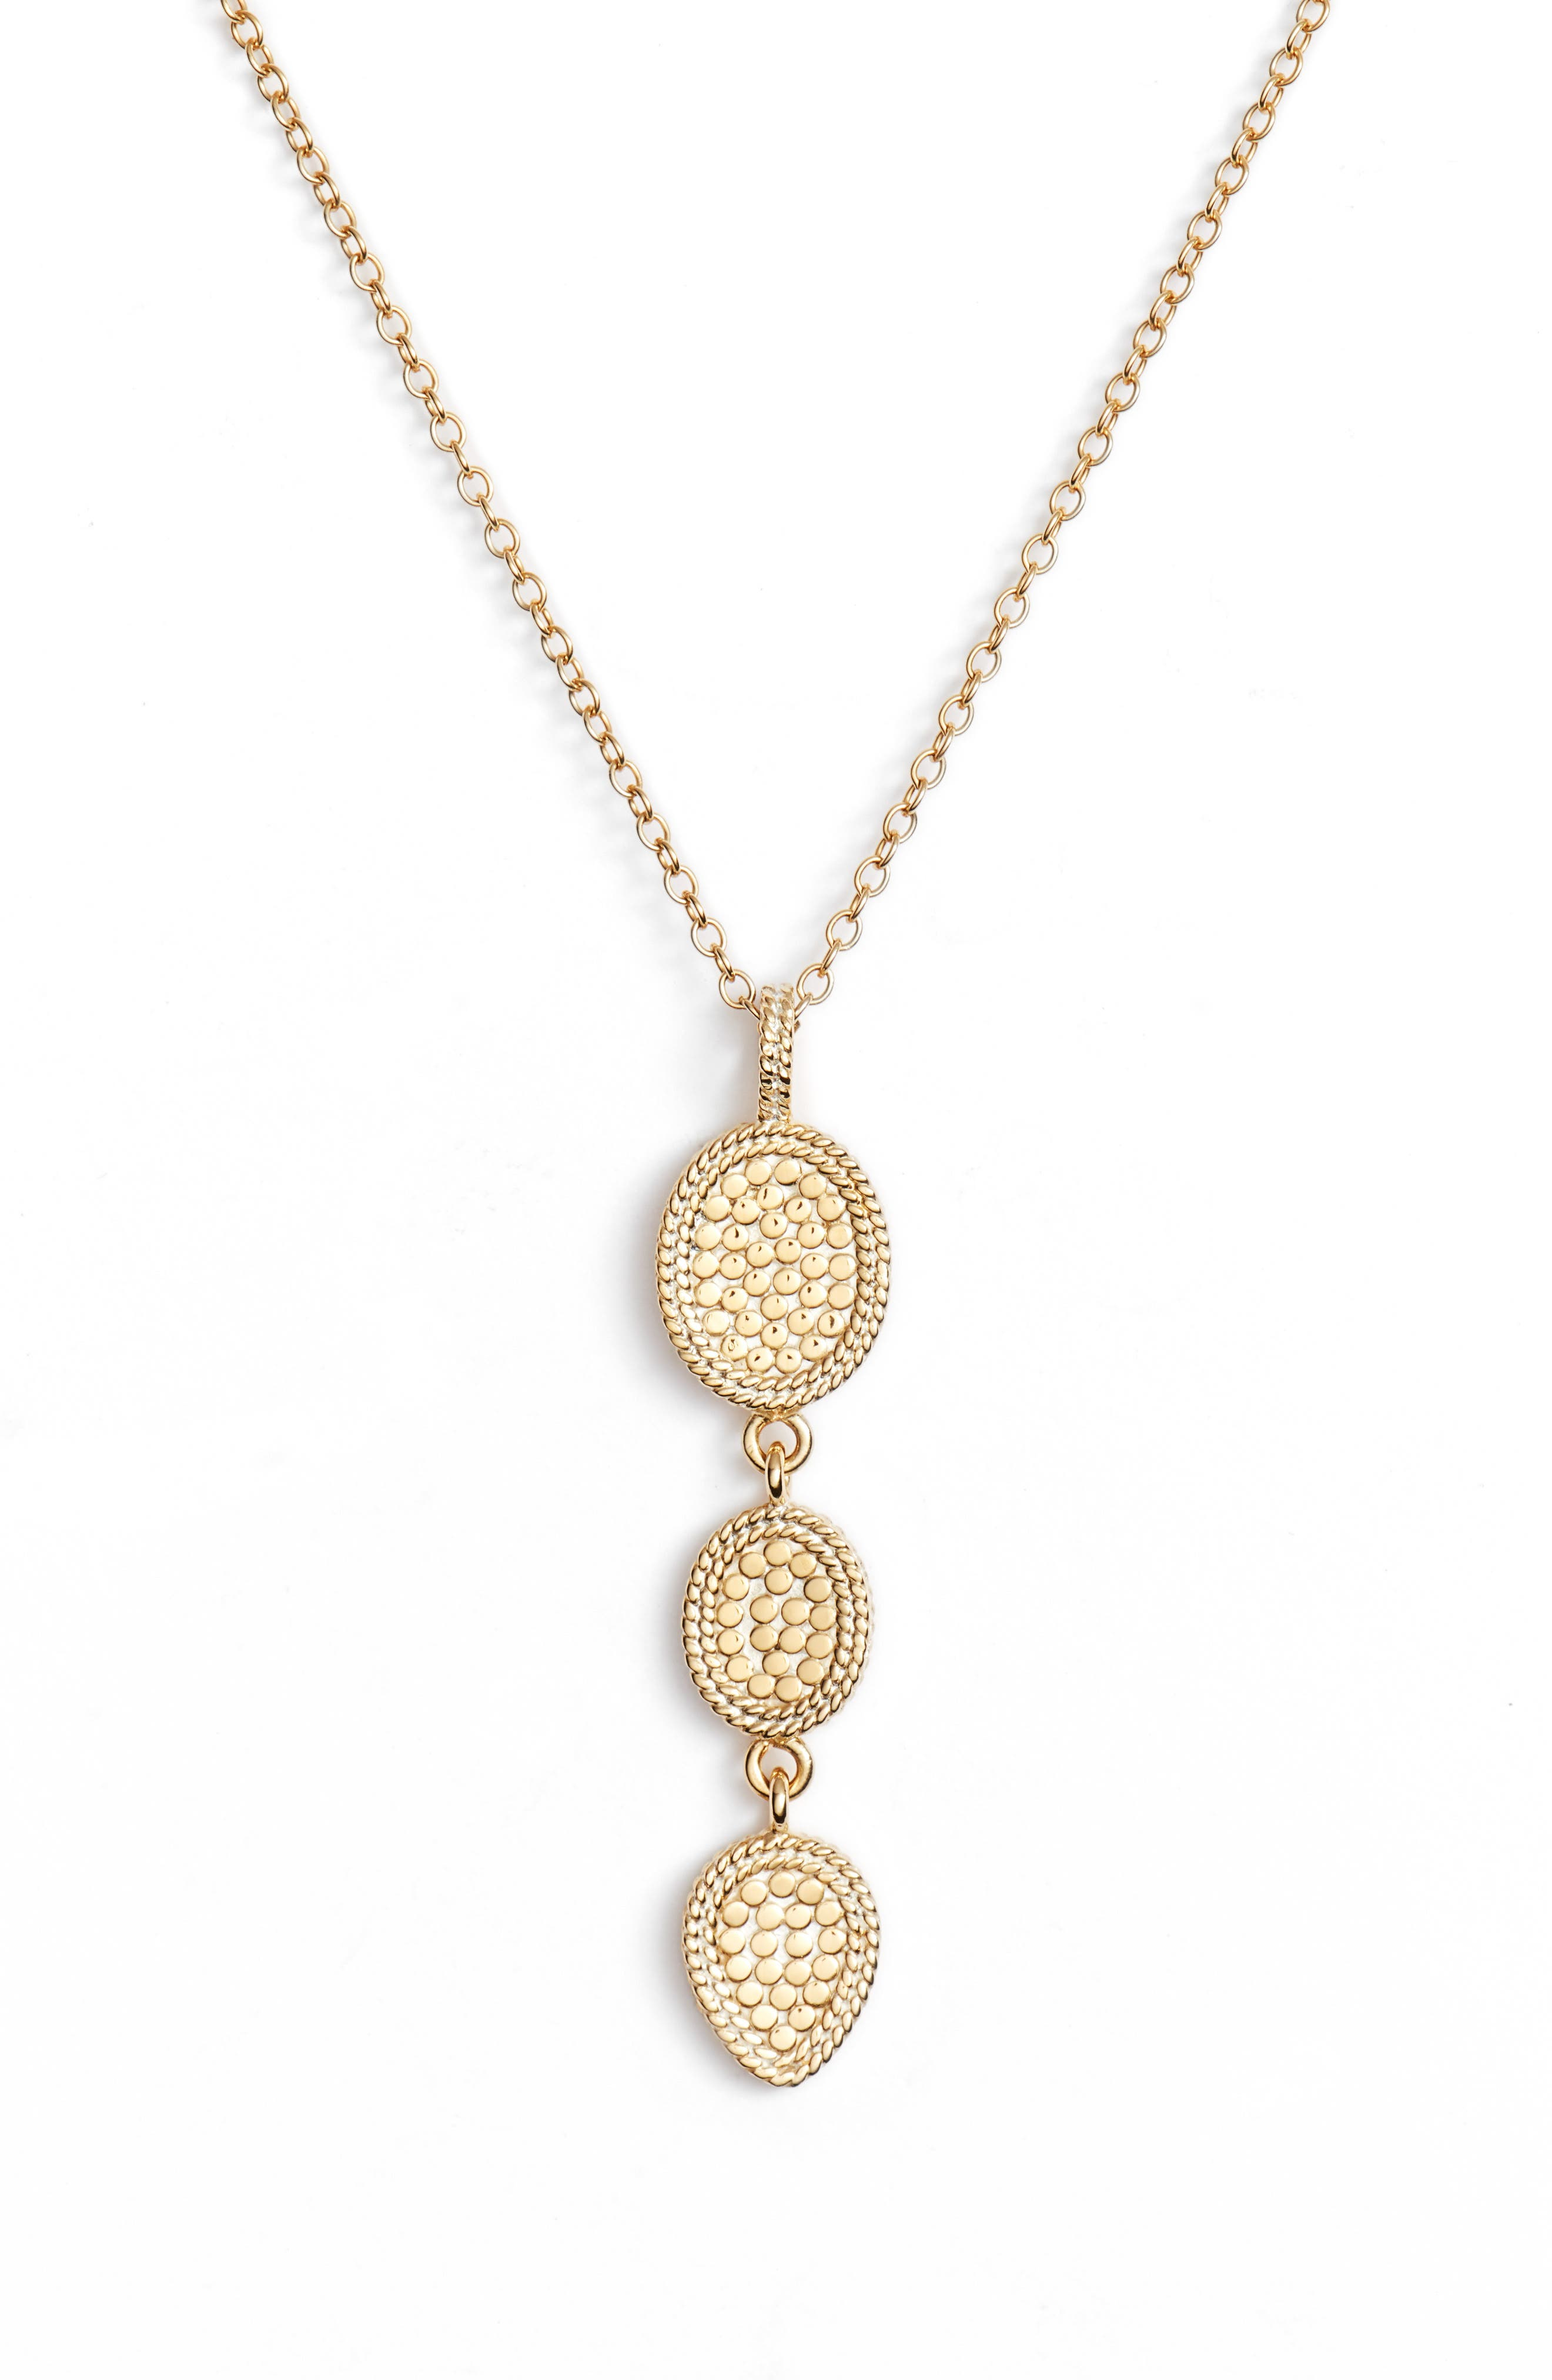 Main Image - Anna Beck Gold Triple Drop Pendant Necklace